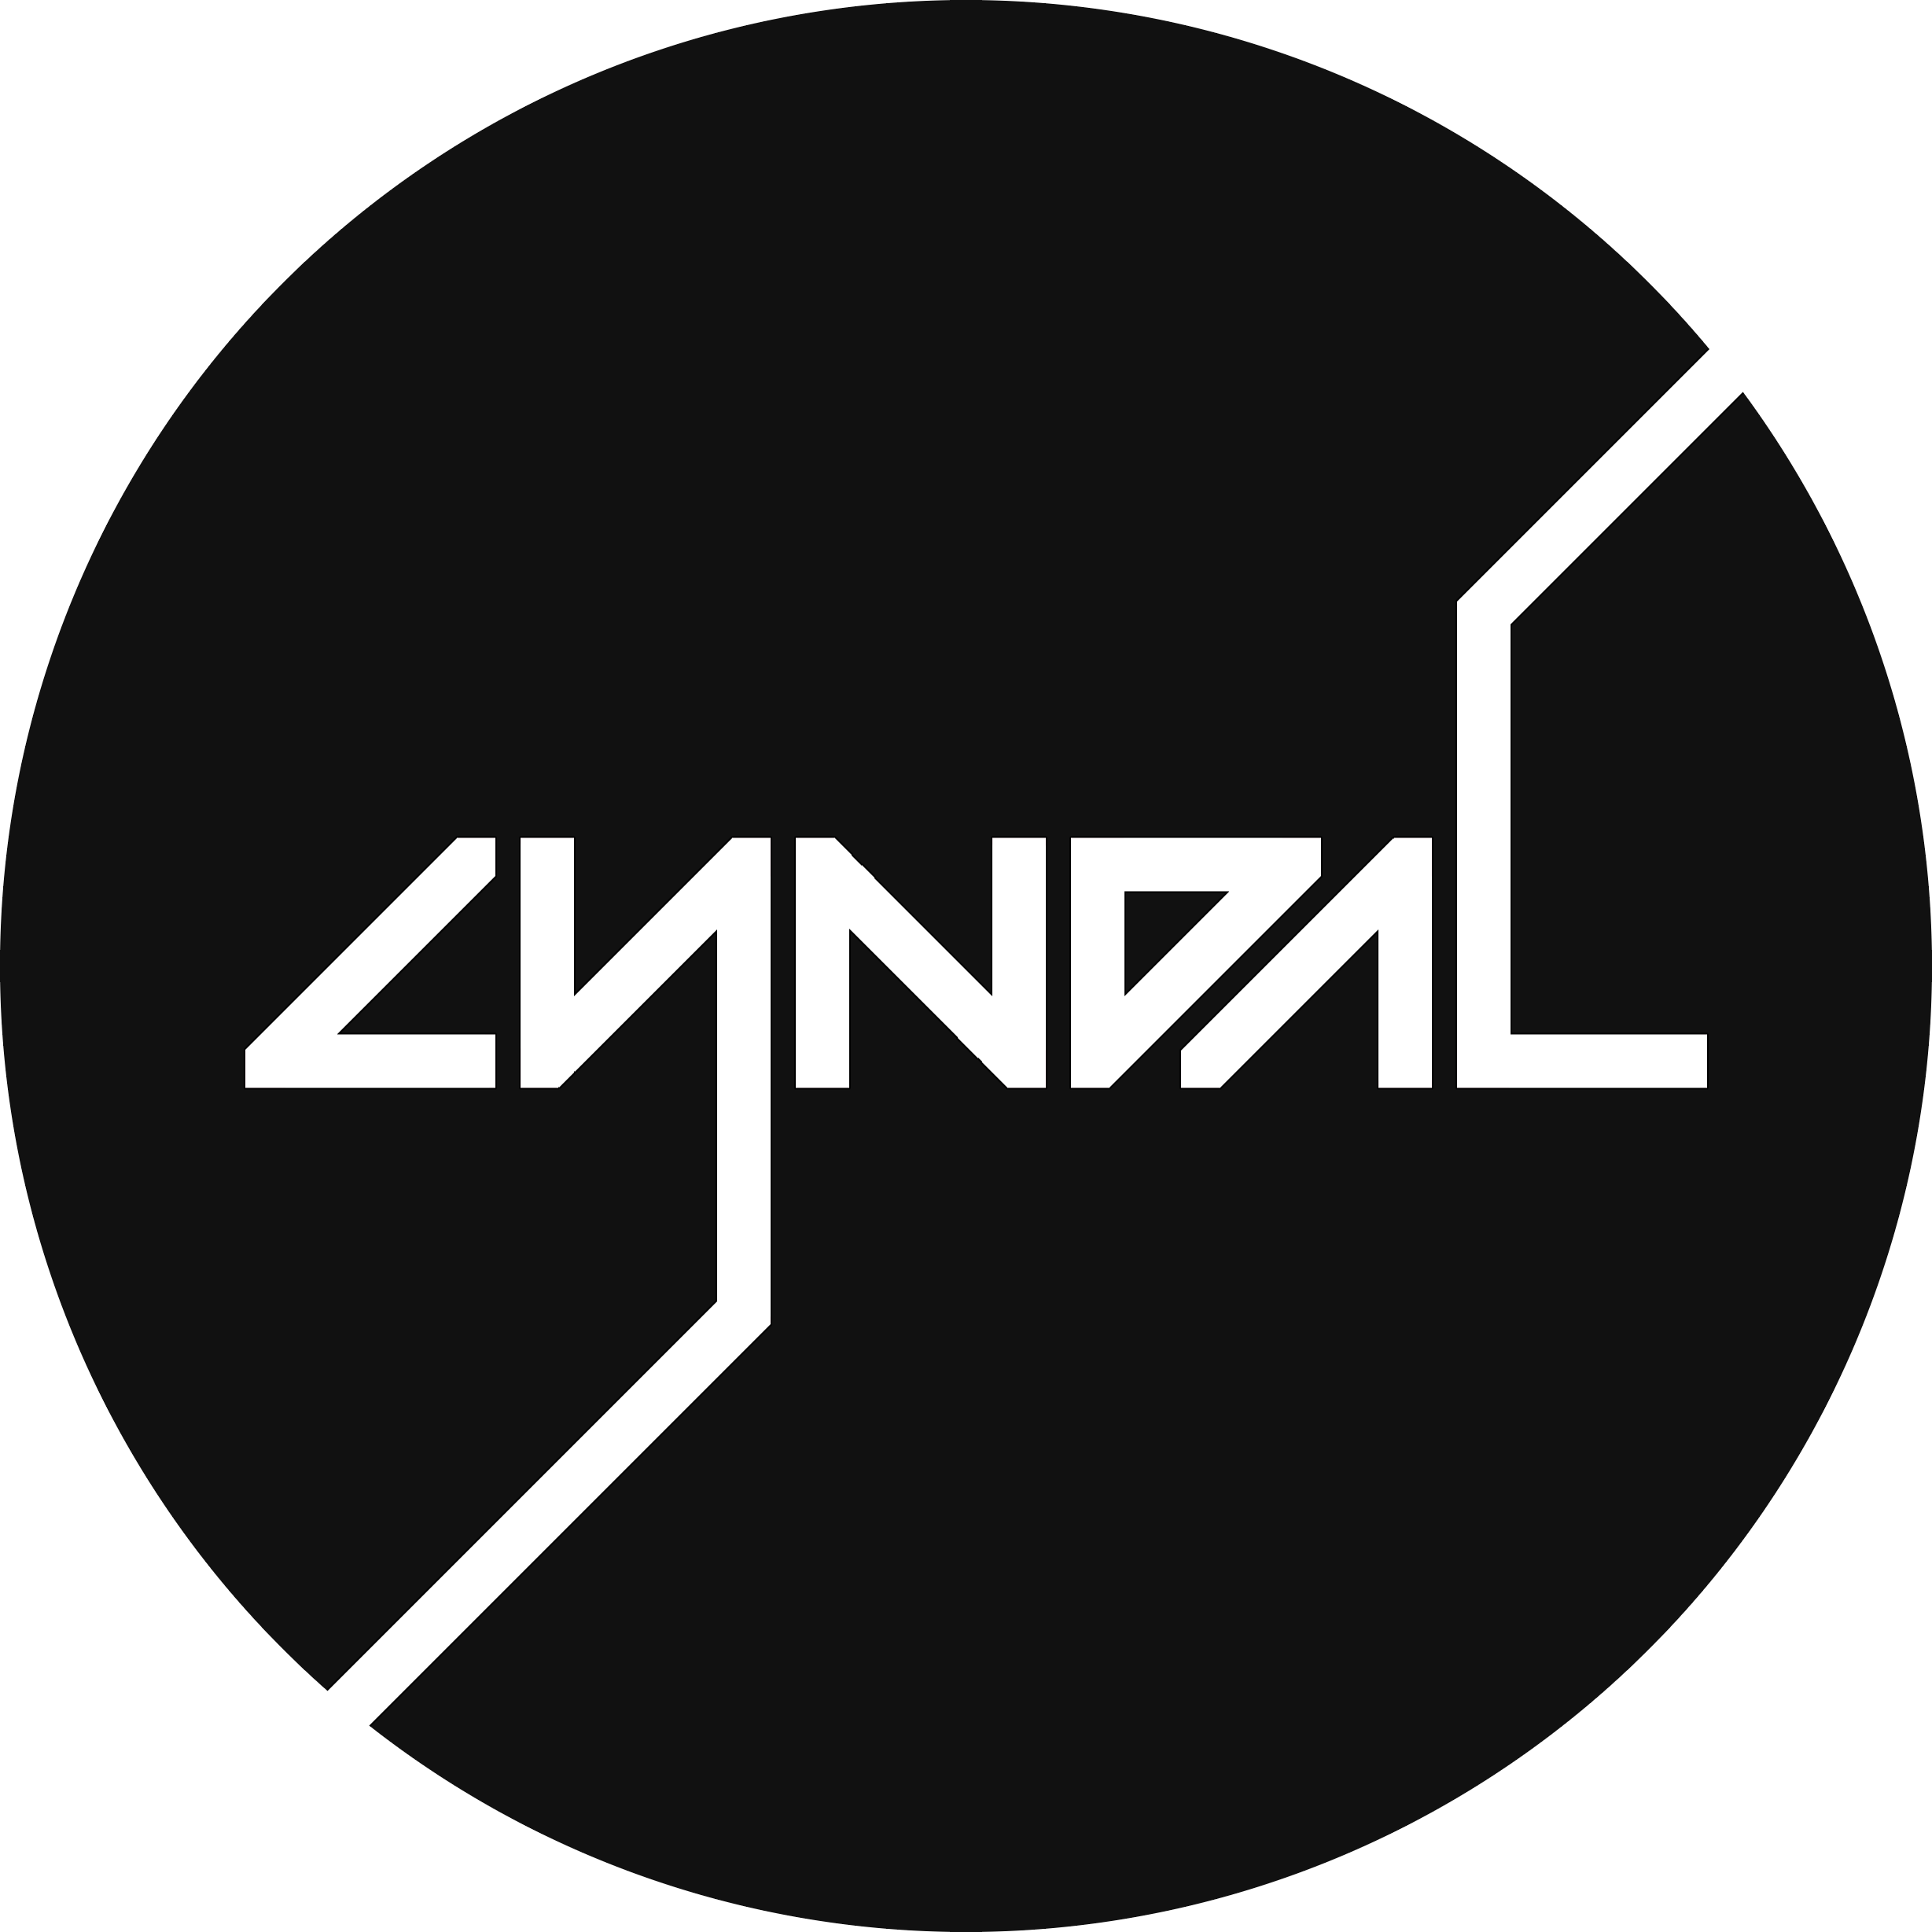 ★ Cyndal Creates ★ (Cyndal) Profile Image | Linktree